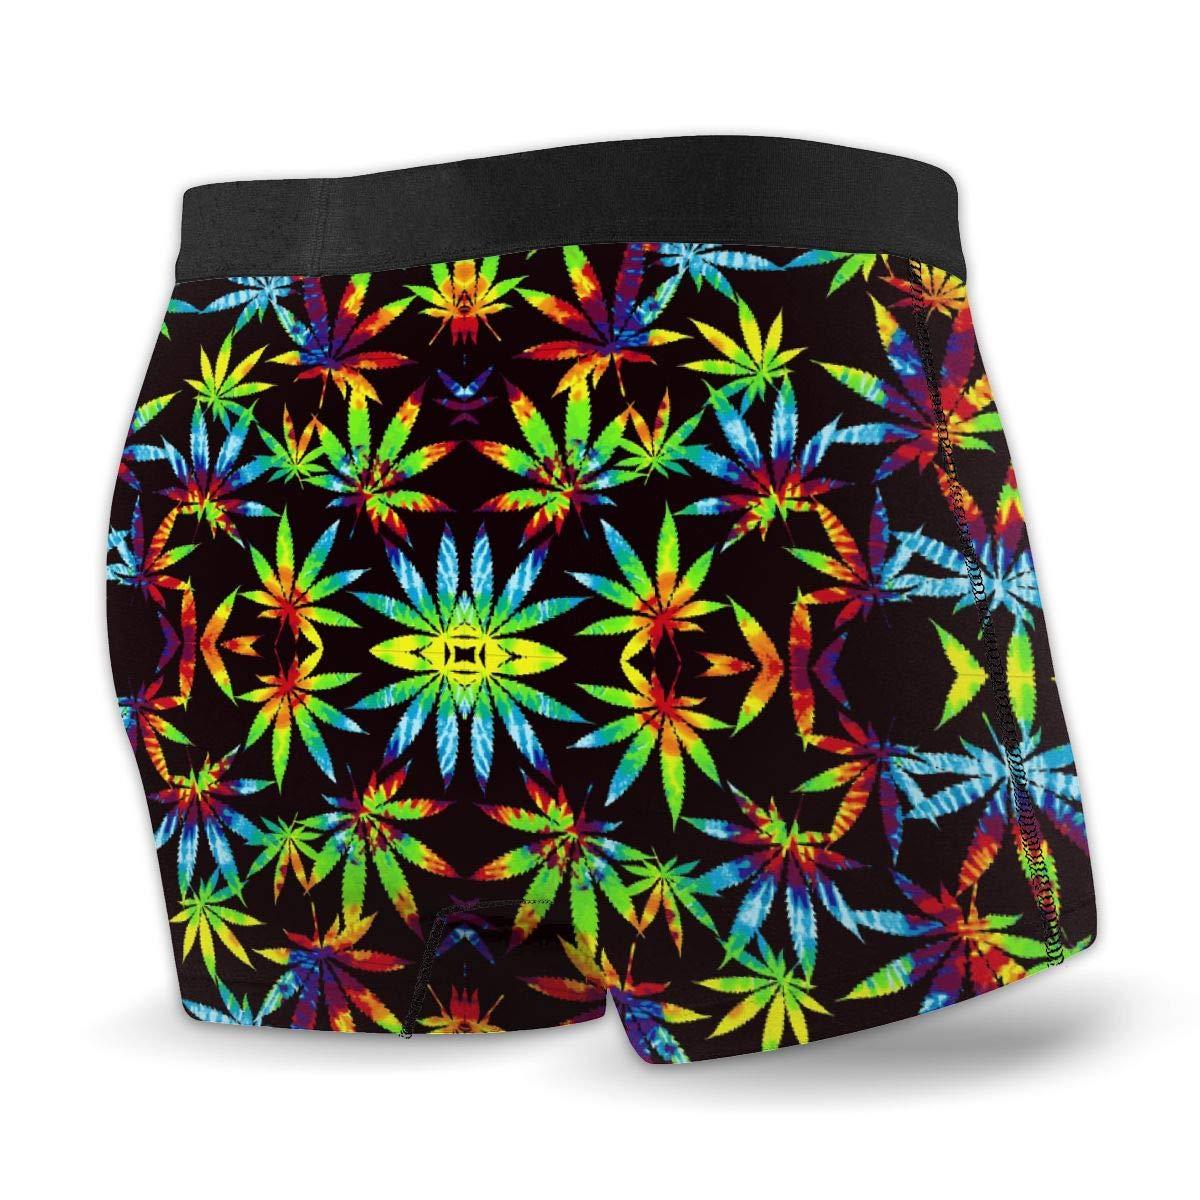 Rolandrace Mens Boxer Brief Tie Dye Pot Leaf Weeds Toddler Underwear Colors Soft